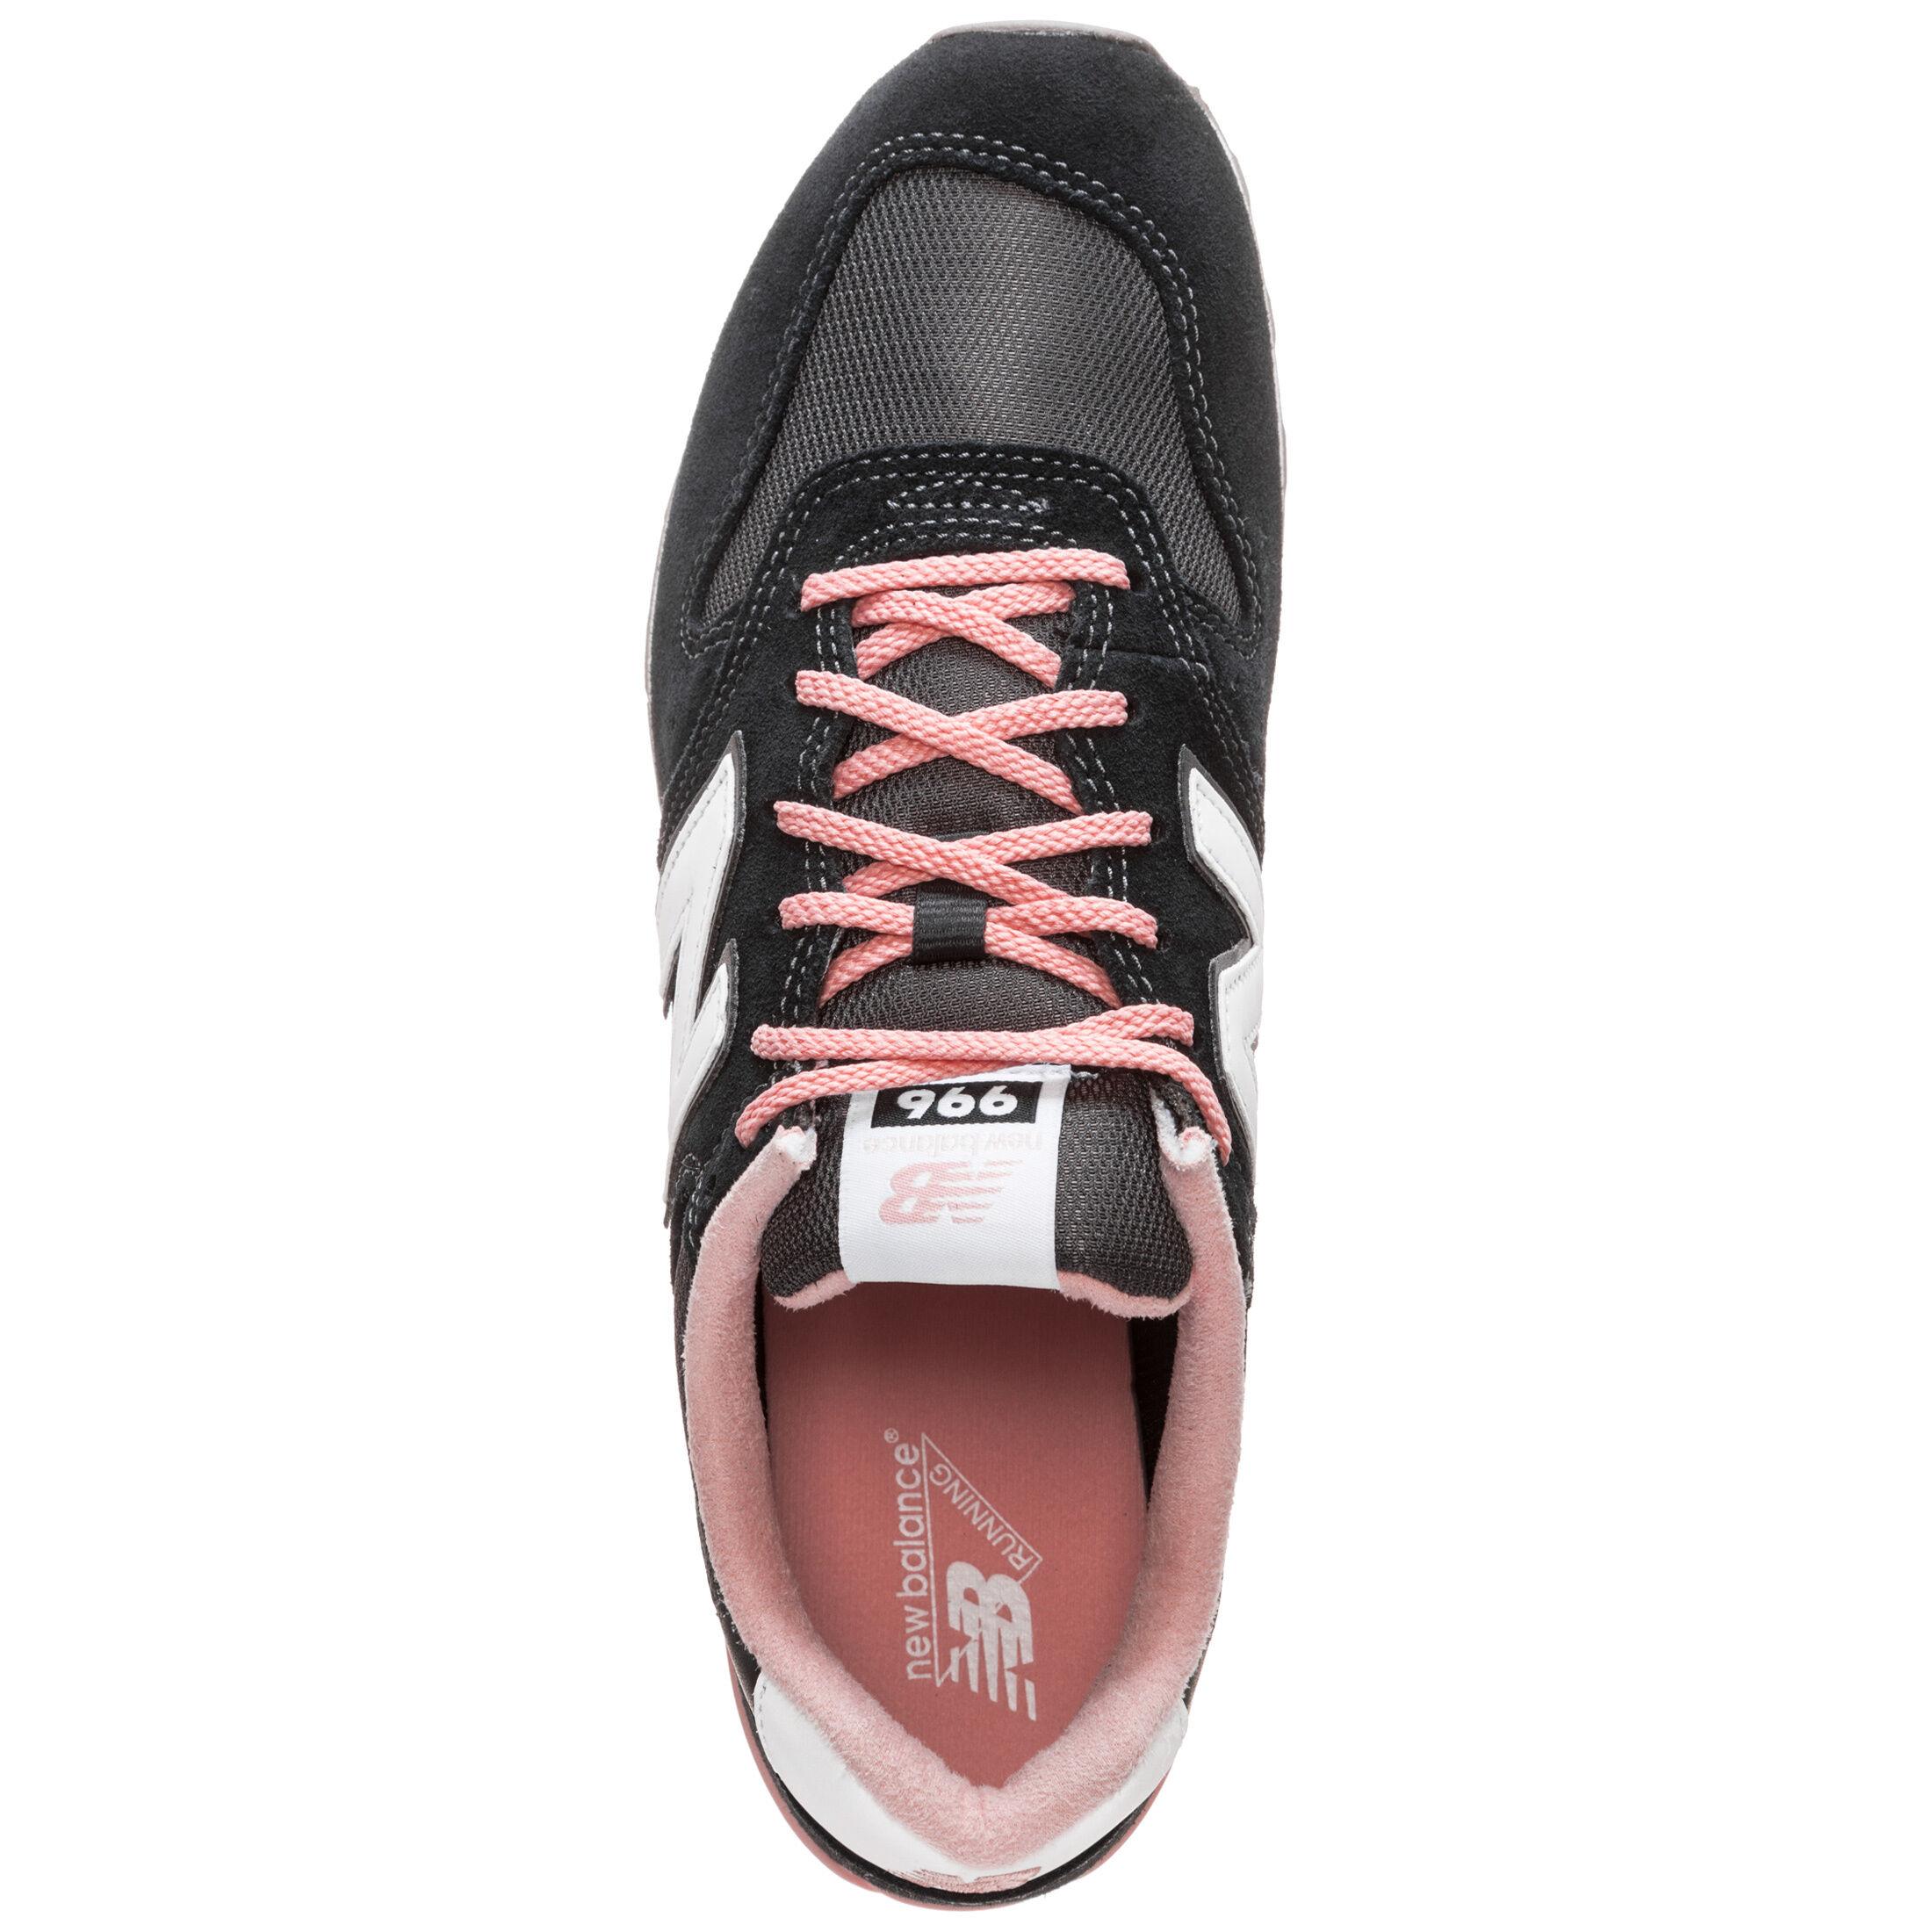 WR996 ACK D Sneaker Damen